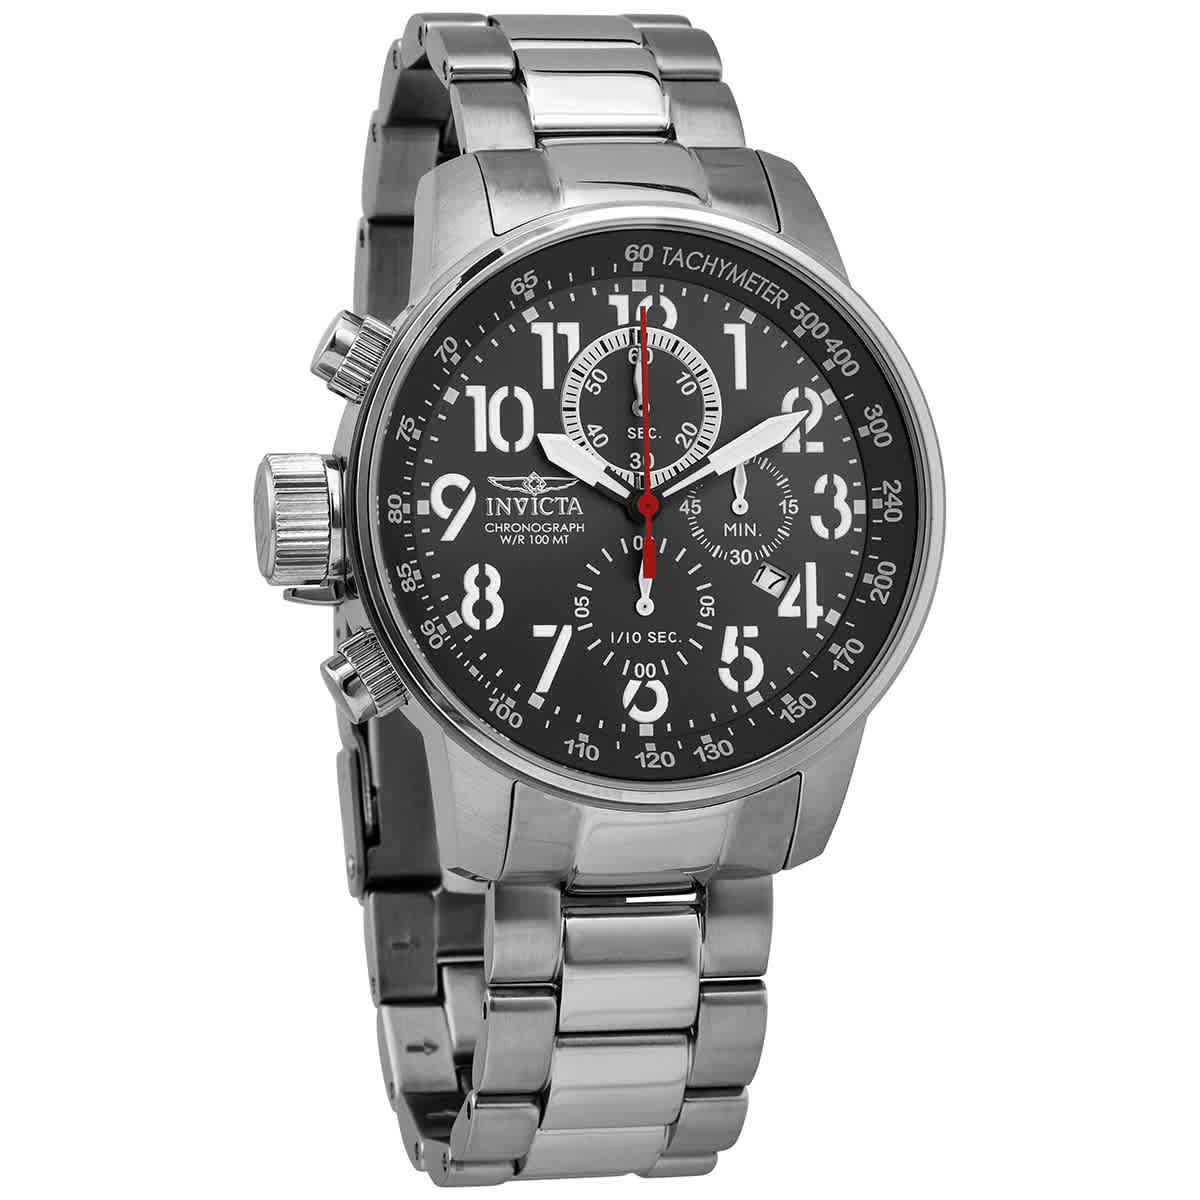 Invicta I-force Chronograph Quartz Gunmetal Dial Mens Watch 28743 In Metallic